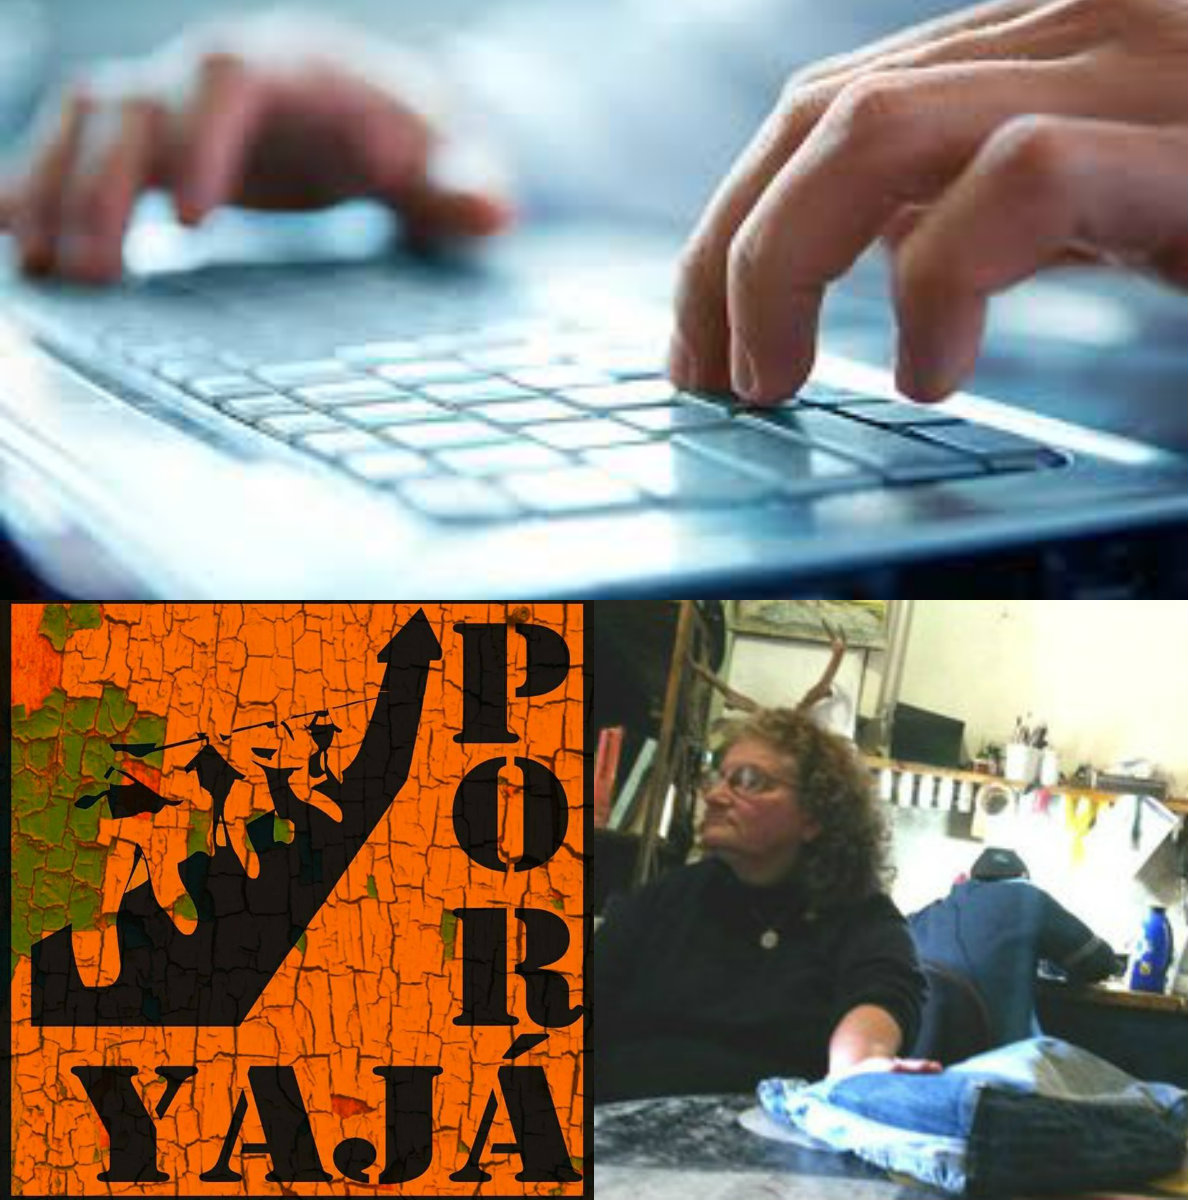 Corrientes: Tecnicatura informática para privadxs de libertad